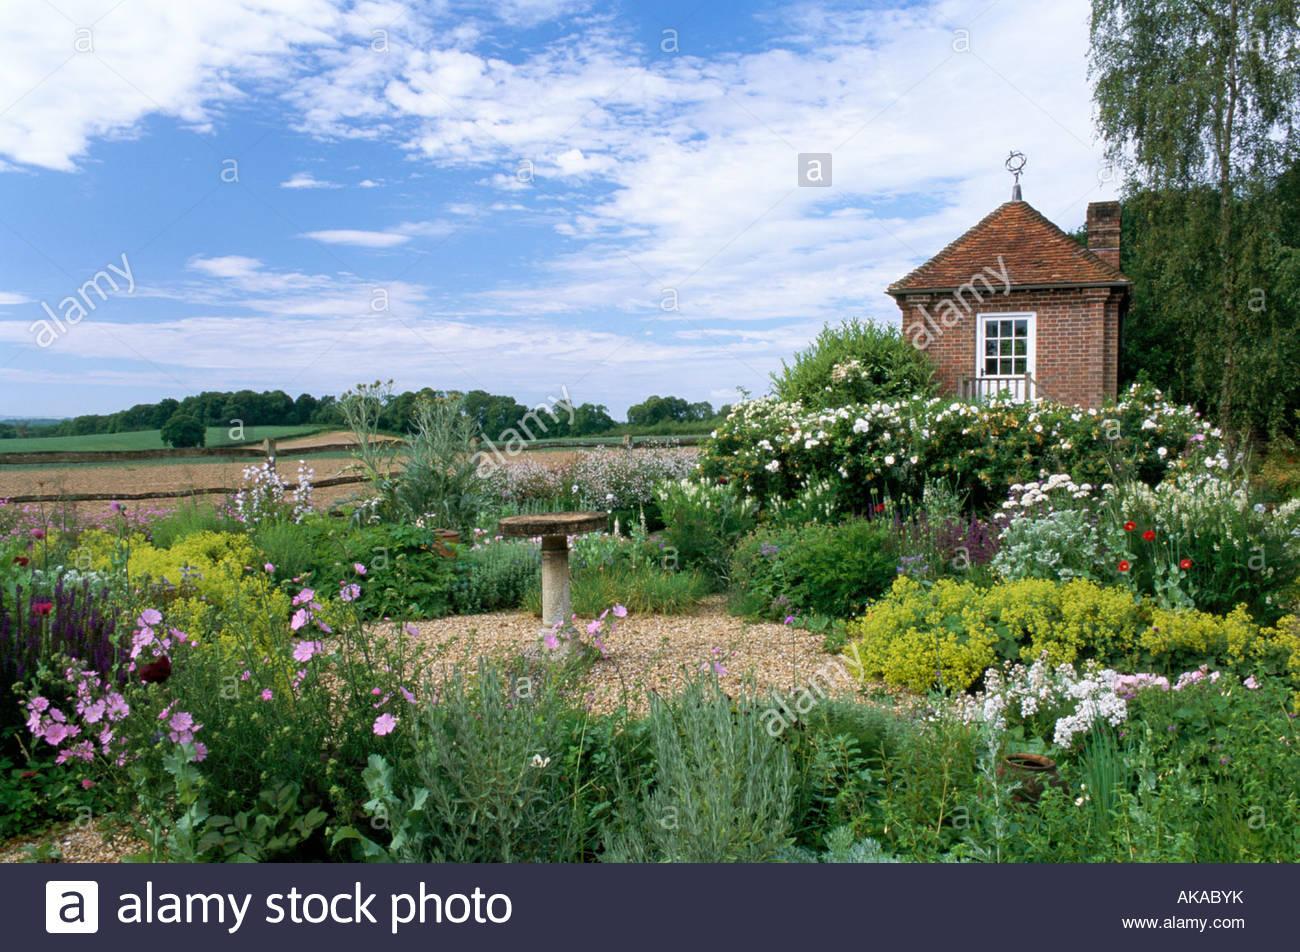 Tos Diy Decorative Gravel Lawn Borders Home Decor Discount Home Decor